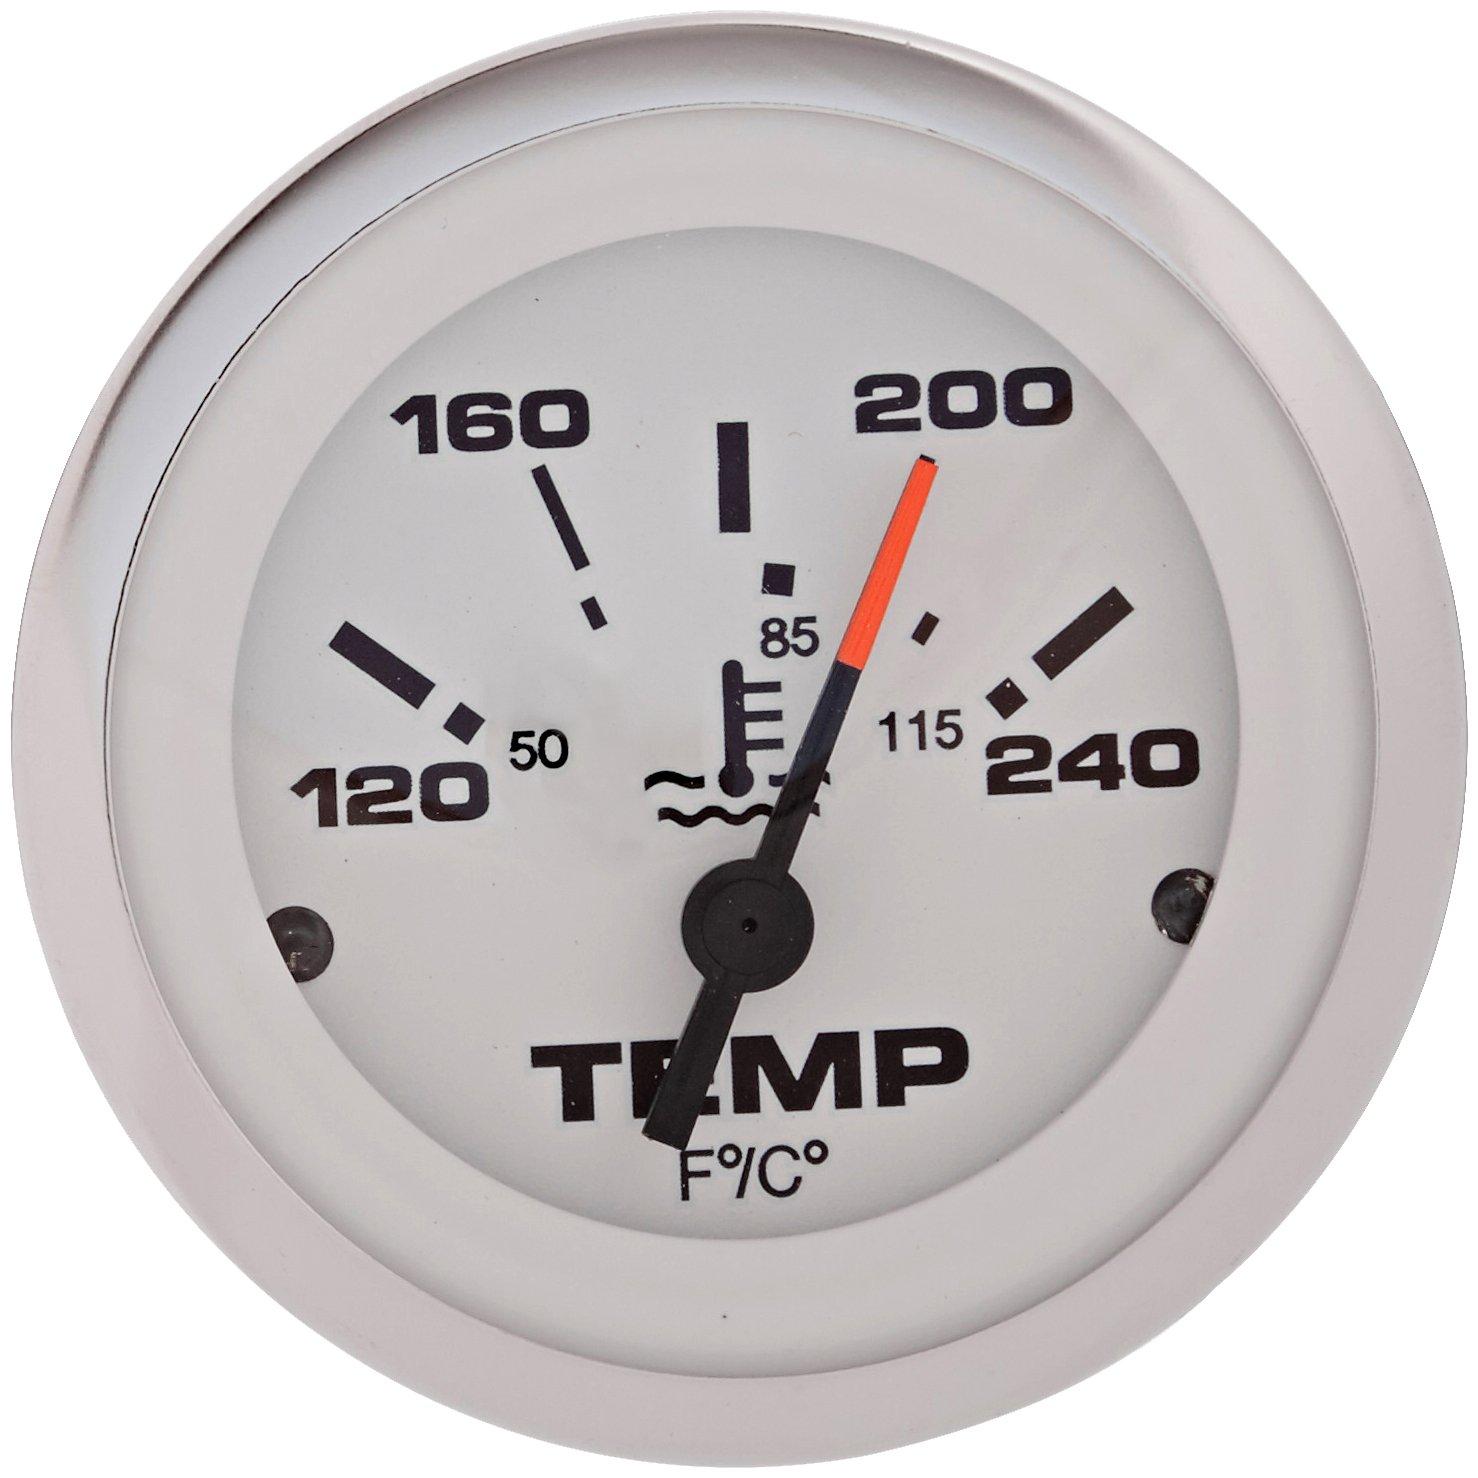 2 Sierra International 65509P Lido 120 to 240 Degrees F Dial Range Scratch Resistant Water Temperature Gauge